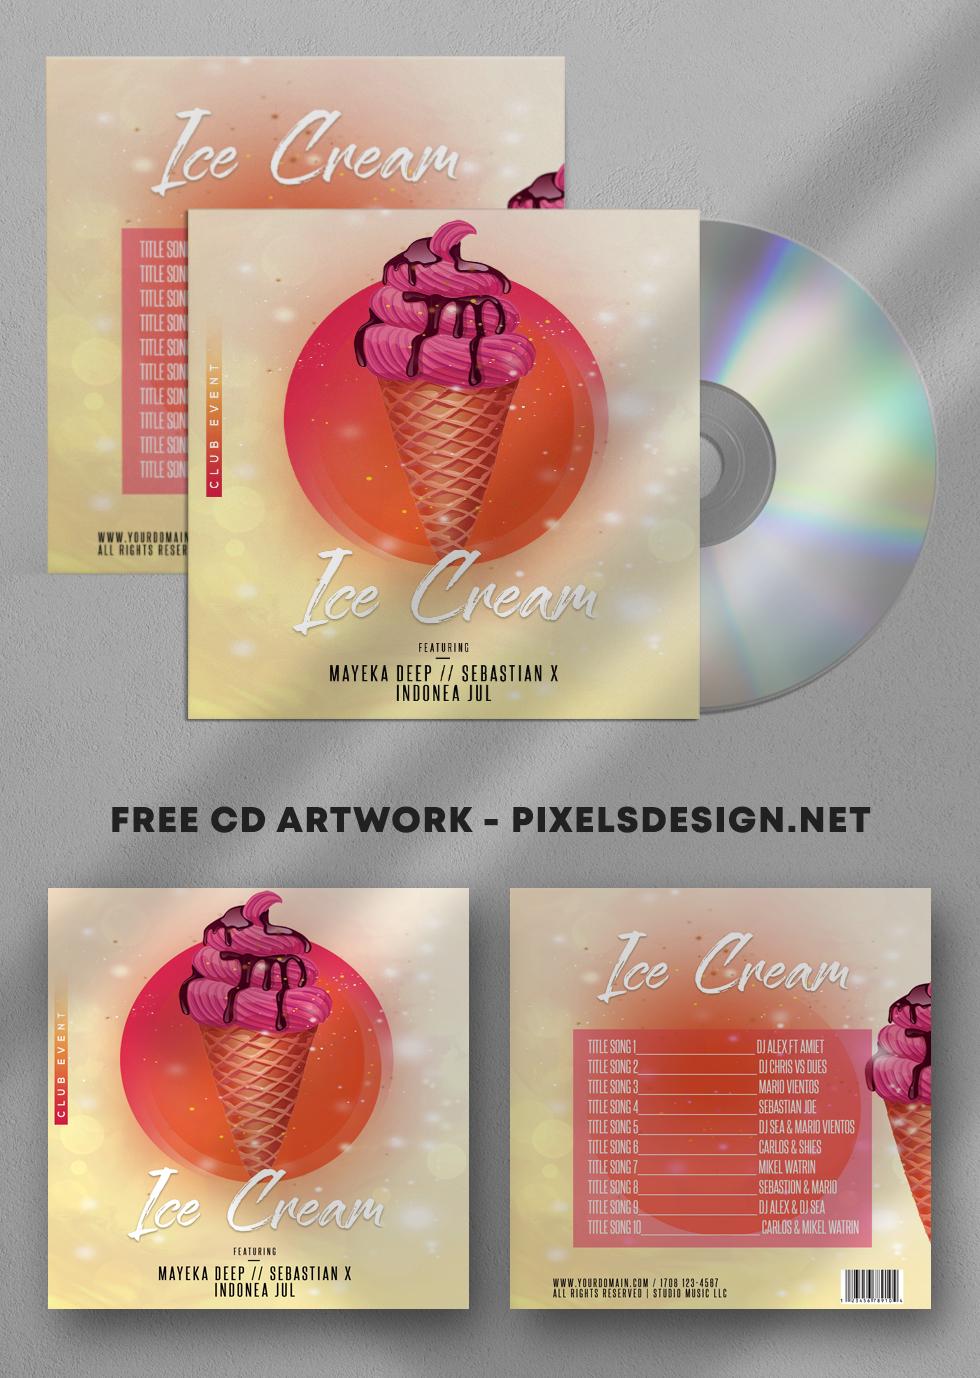 Ice Cream Free CD Artwork PSD Template